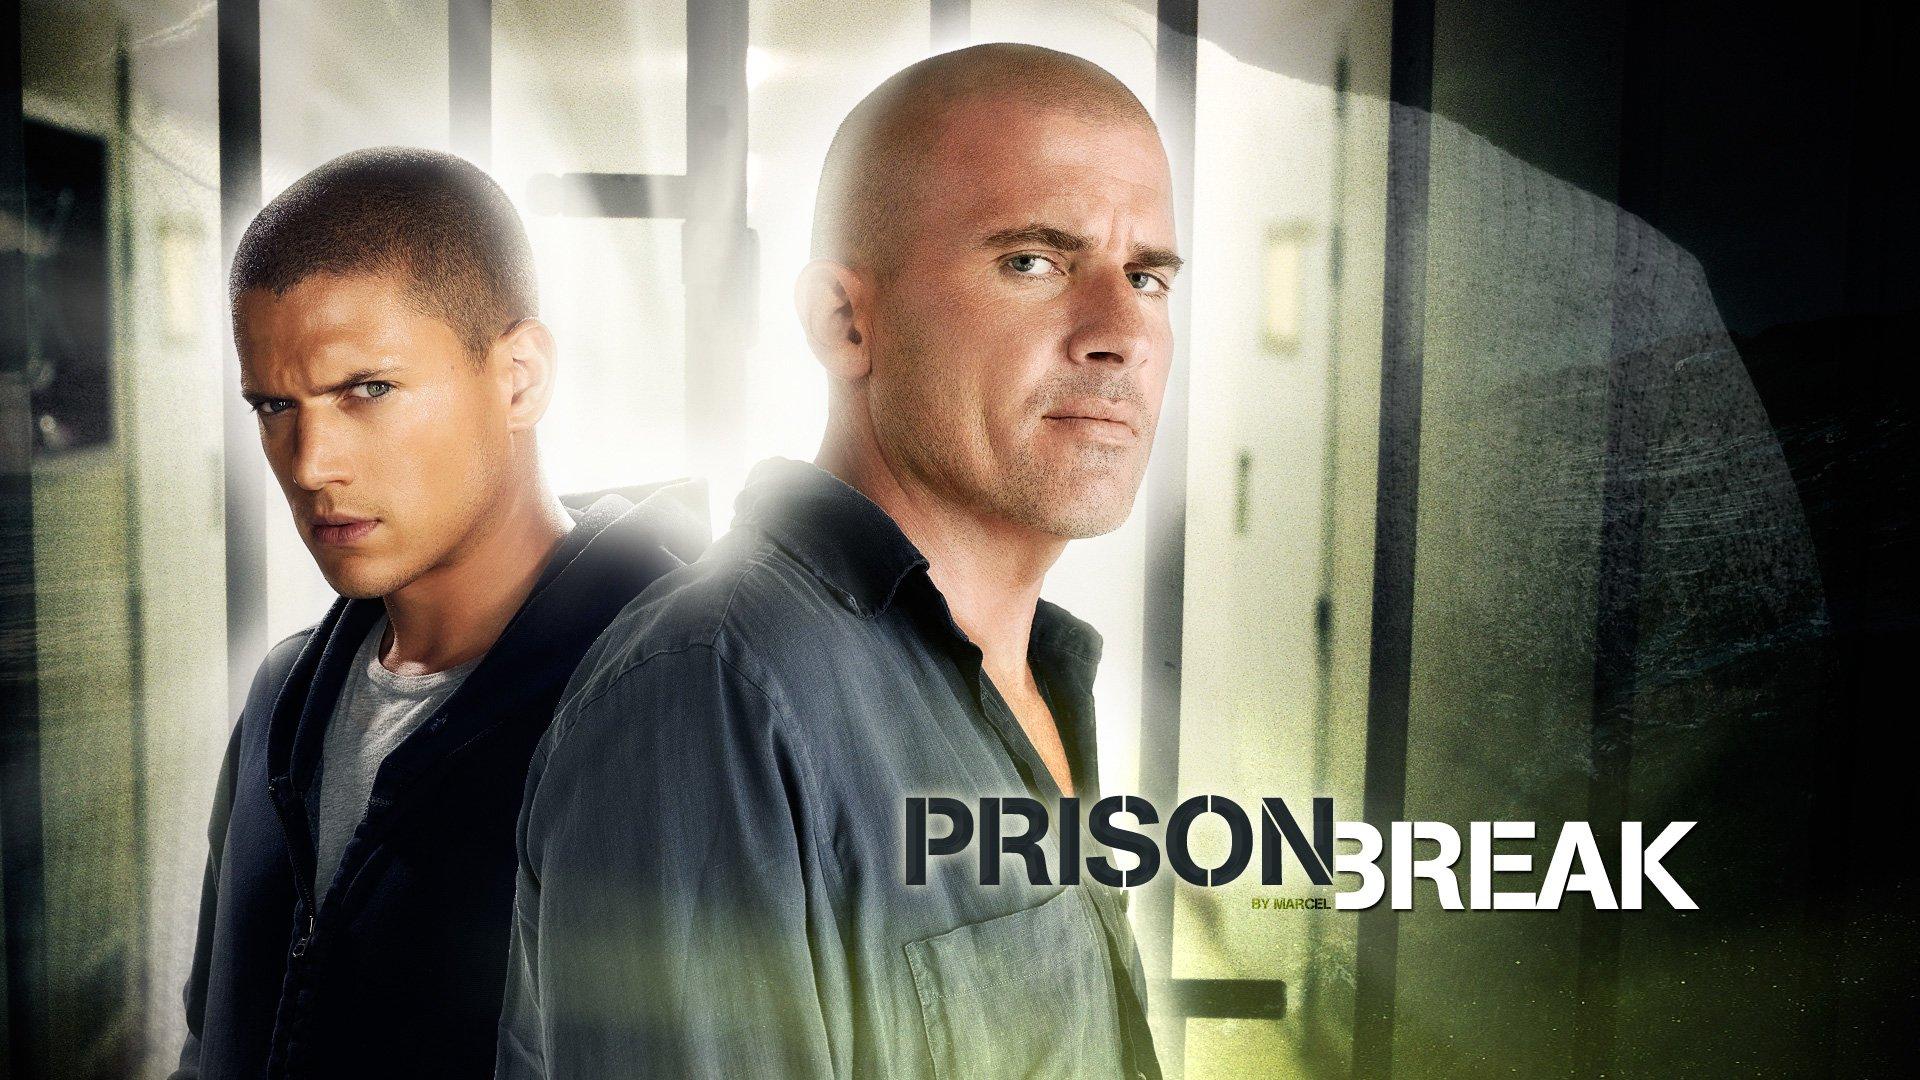 Prison Break Hd Wallpapers Download Prison Break Full Hd Wallpaper And Background Image